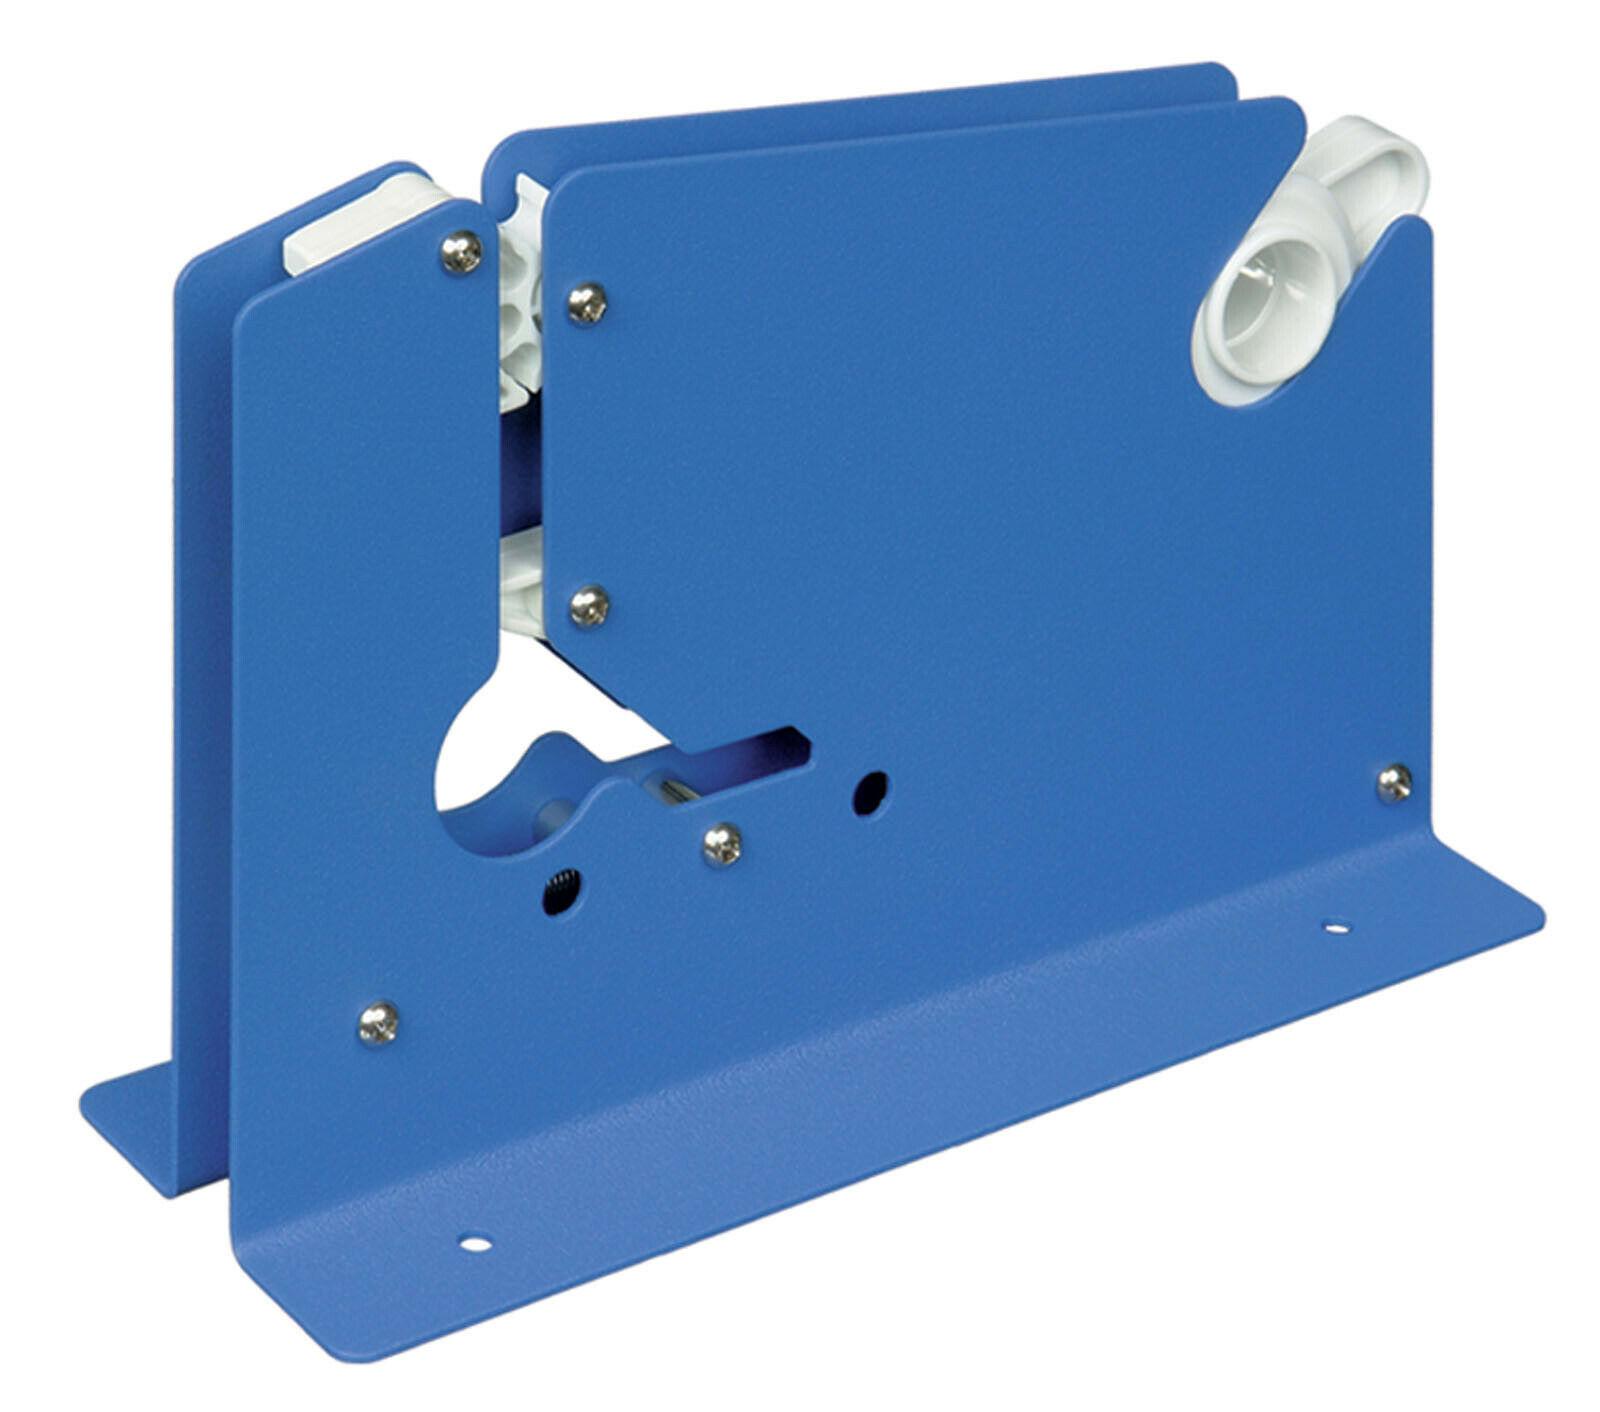 BN9 Metal Bench Desktop Tape Dispenser Bag Neck Sealer for 9mm 12mm Tapes 133073799758 - BN9 Metal Bench Desktop Tape Dispenser Bag Neck Sealer for 9mm 12mm Tapes